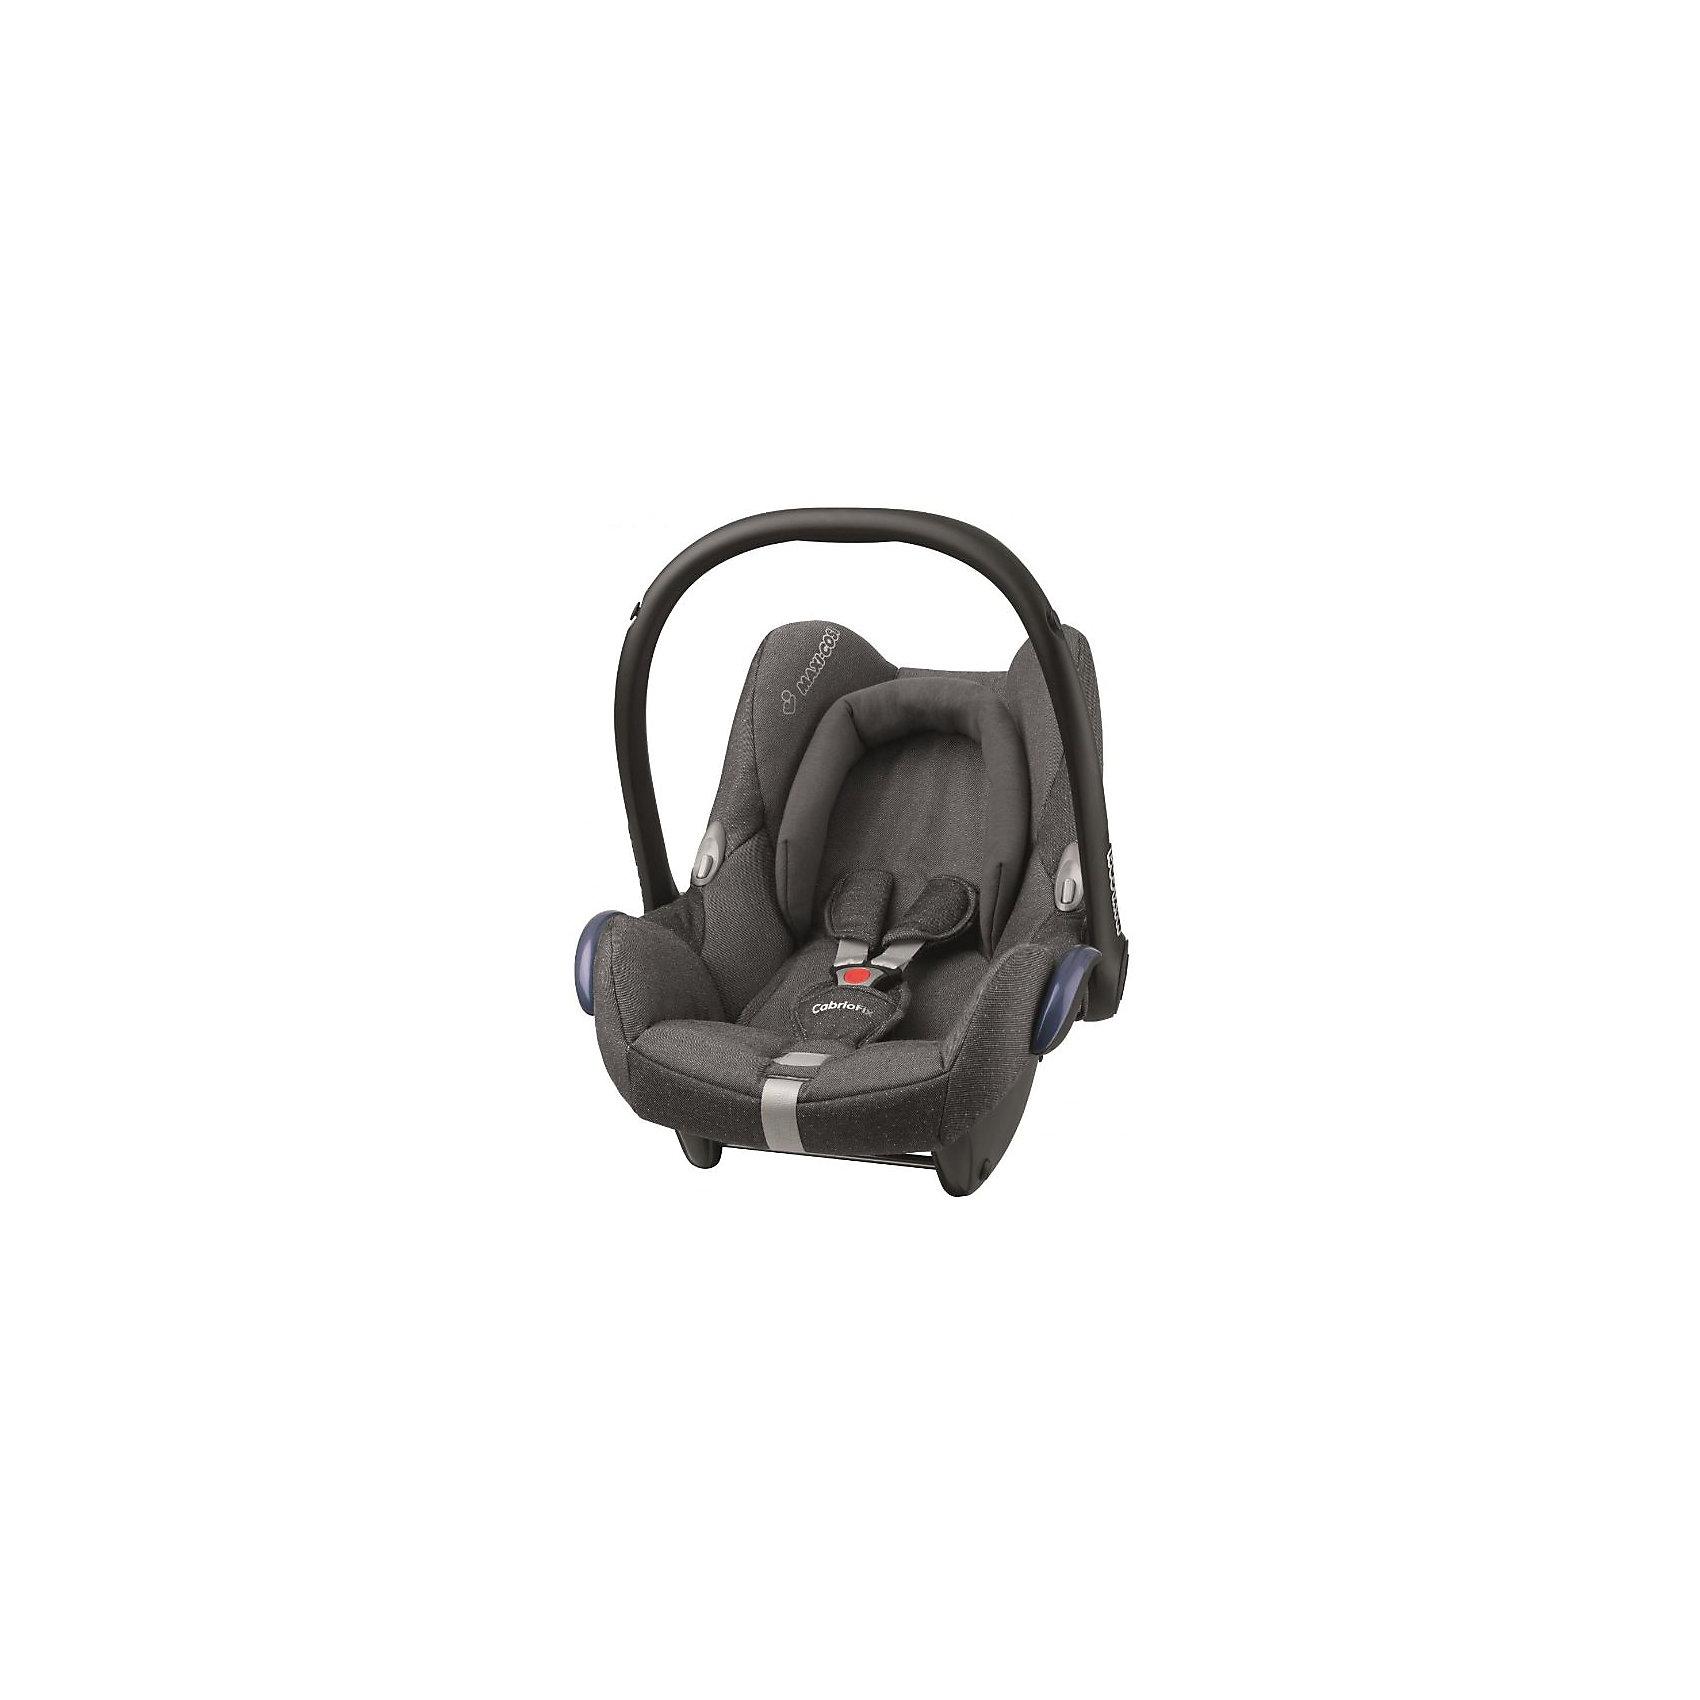 Maxi Cosi Автокресло Maxi-Cosi CabrioFix 0-13 кг, Sparcling Grey